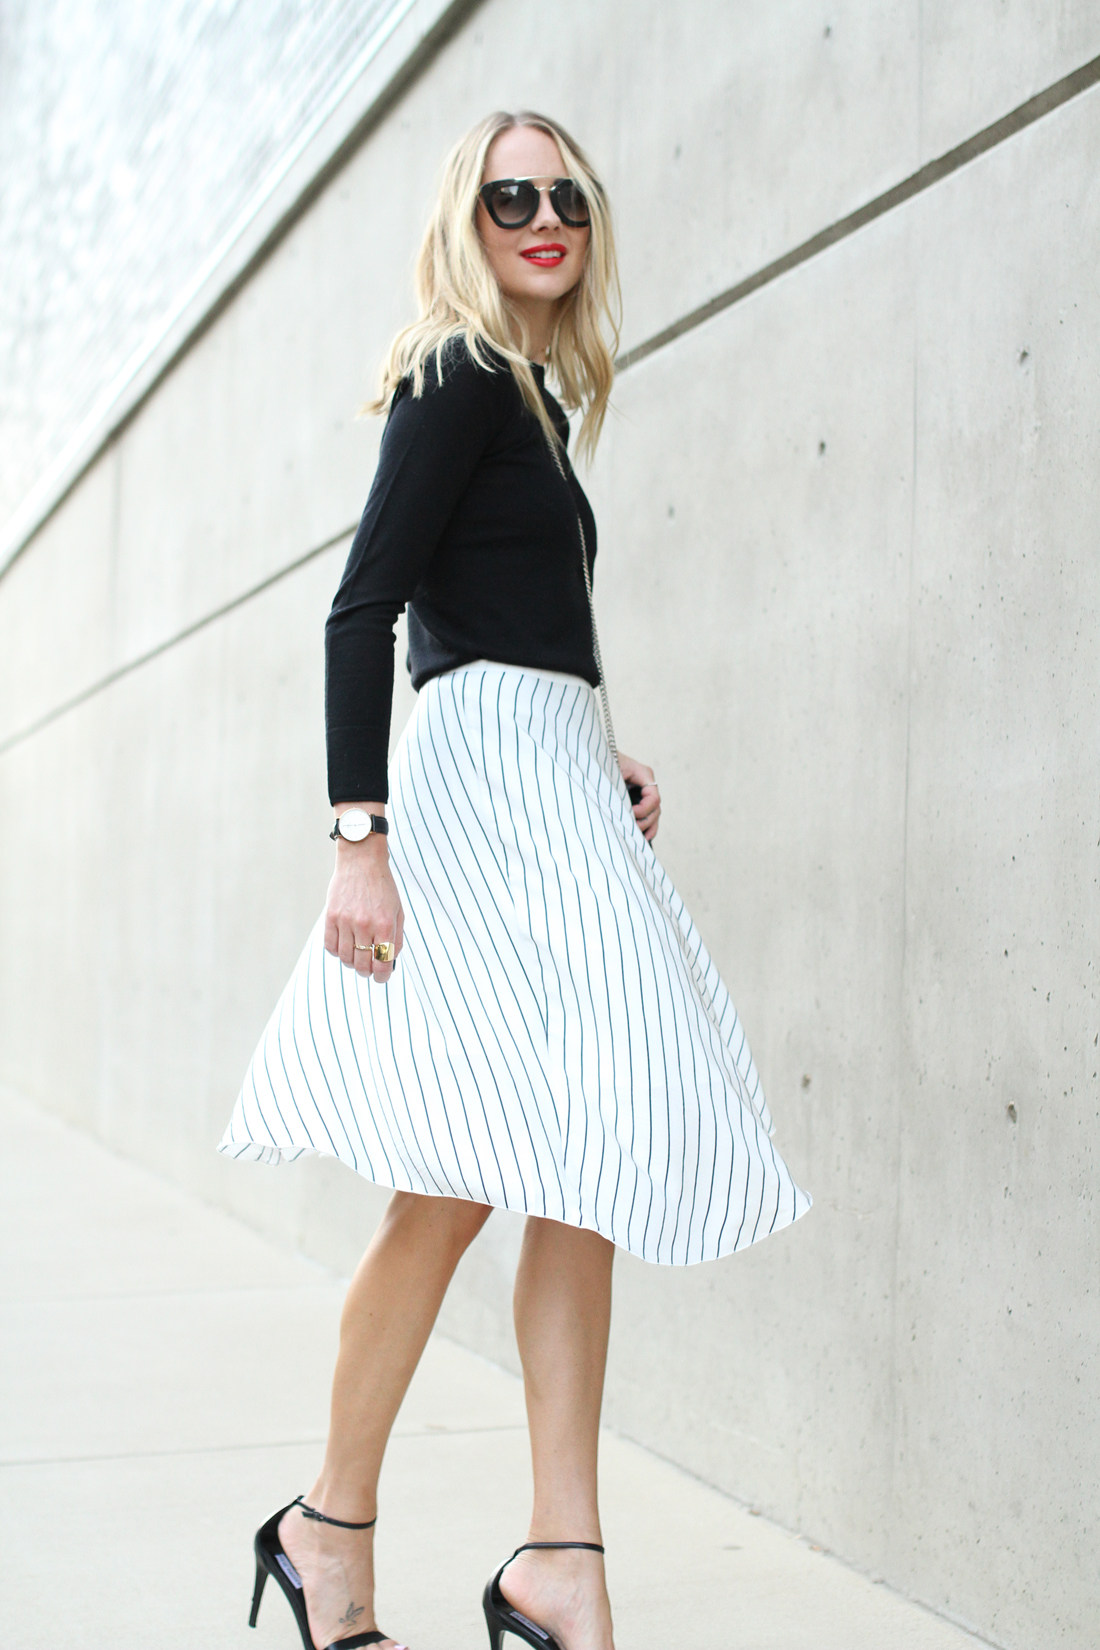 fashion-jackson-club-monaco-white-asymmetrical-skirt-black-sweater-prada-sunglasses